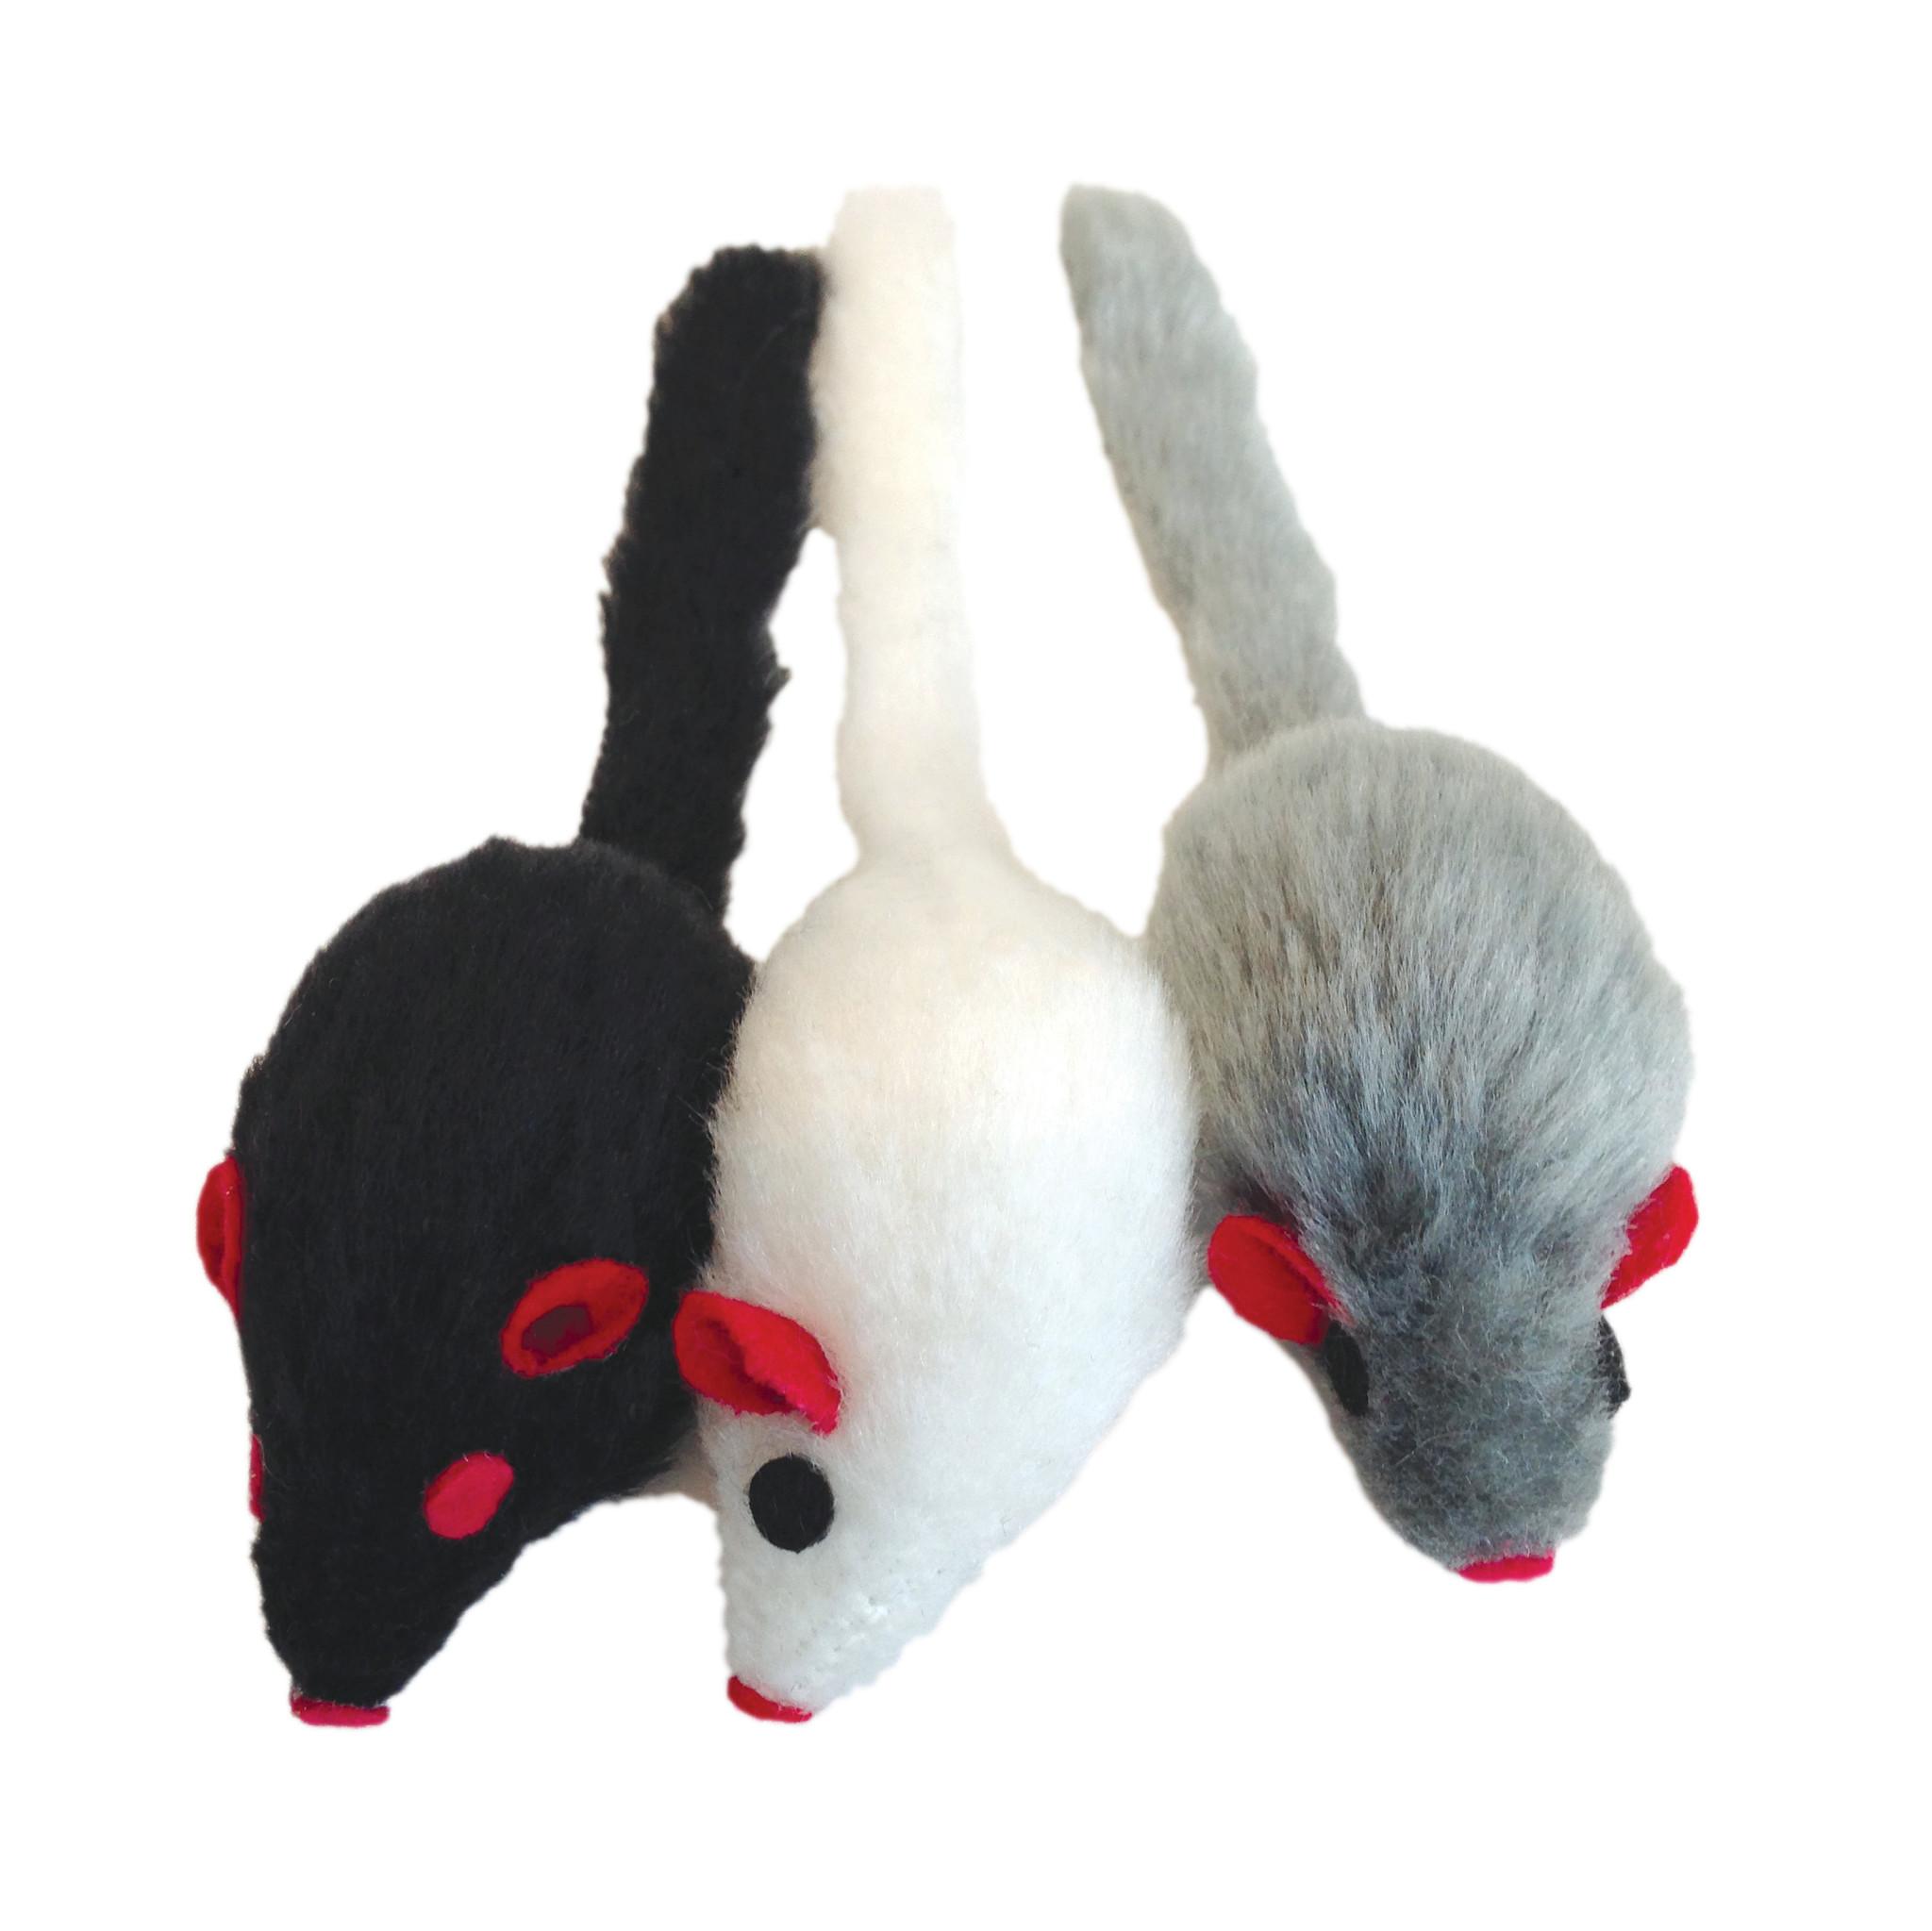 CL Furry Frolics, Catnip Furry Mice 3pck-1